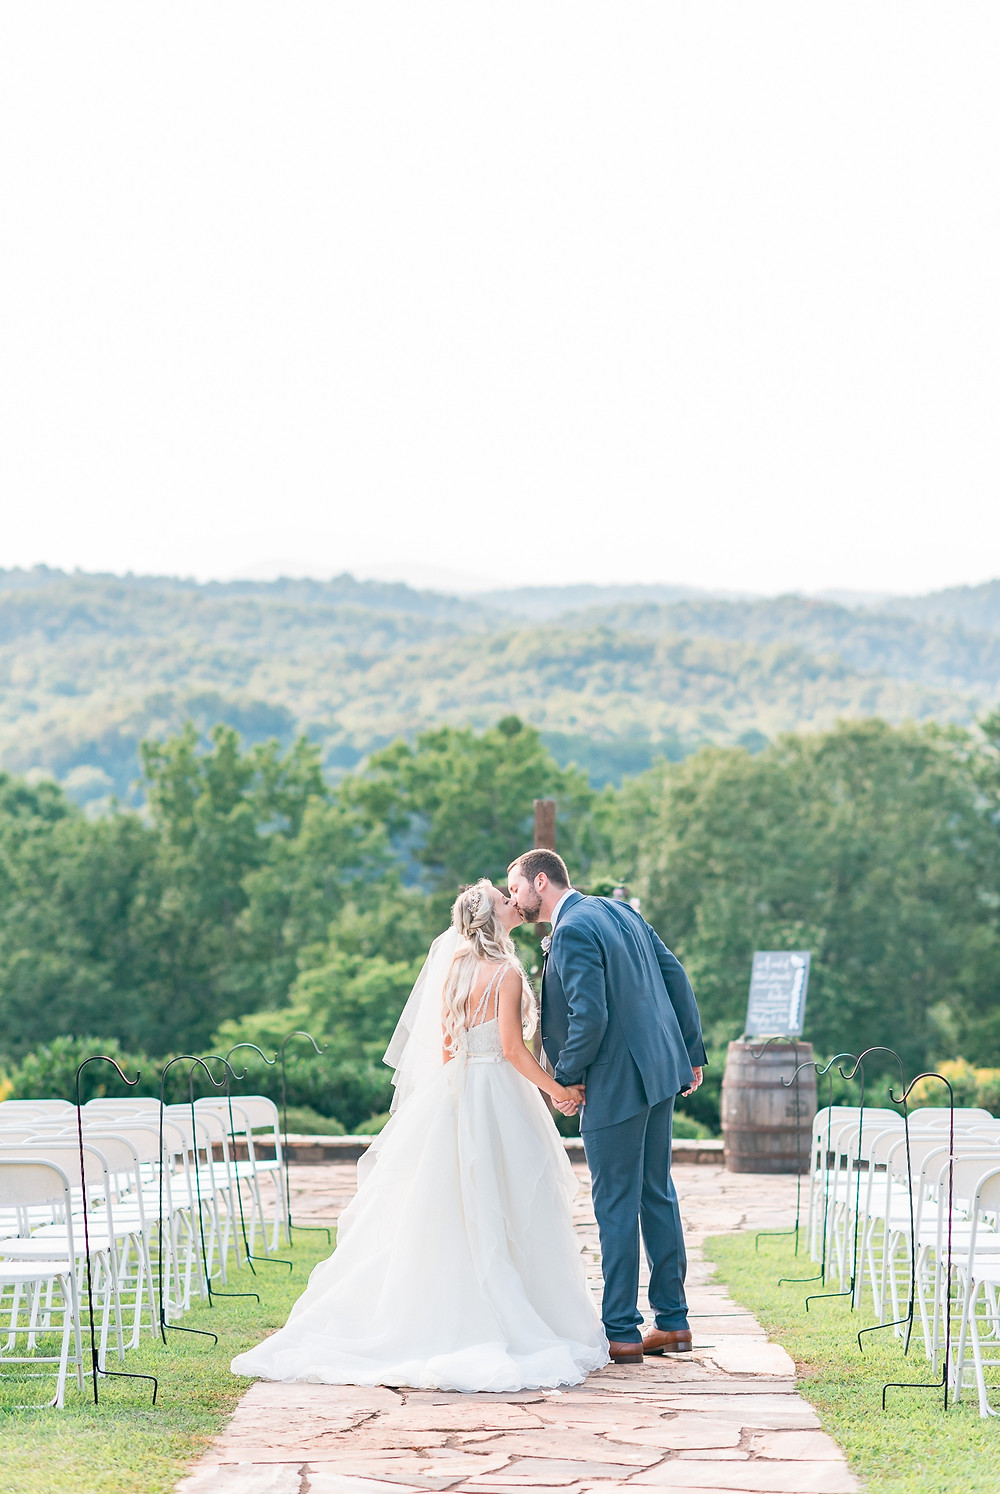 blue mountain vineyard dahlonega wedding venue-glorious moments photography-atlanta wedding photographer-vineyard mountain view